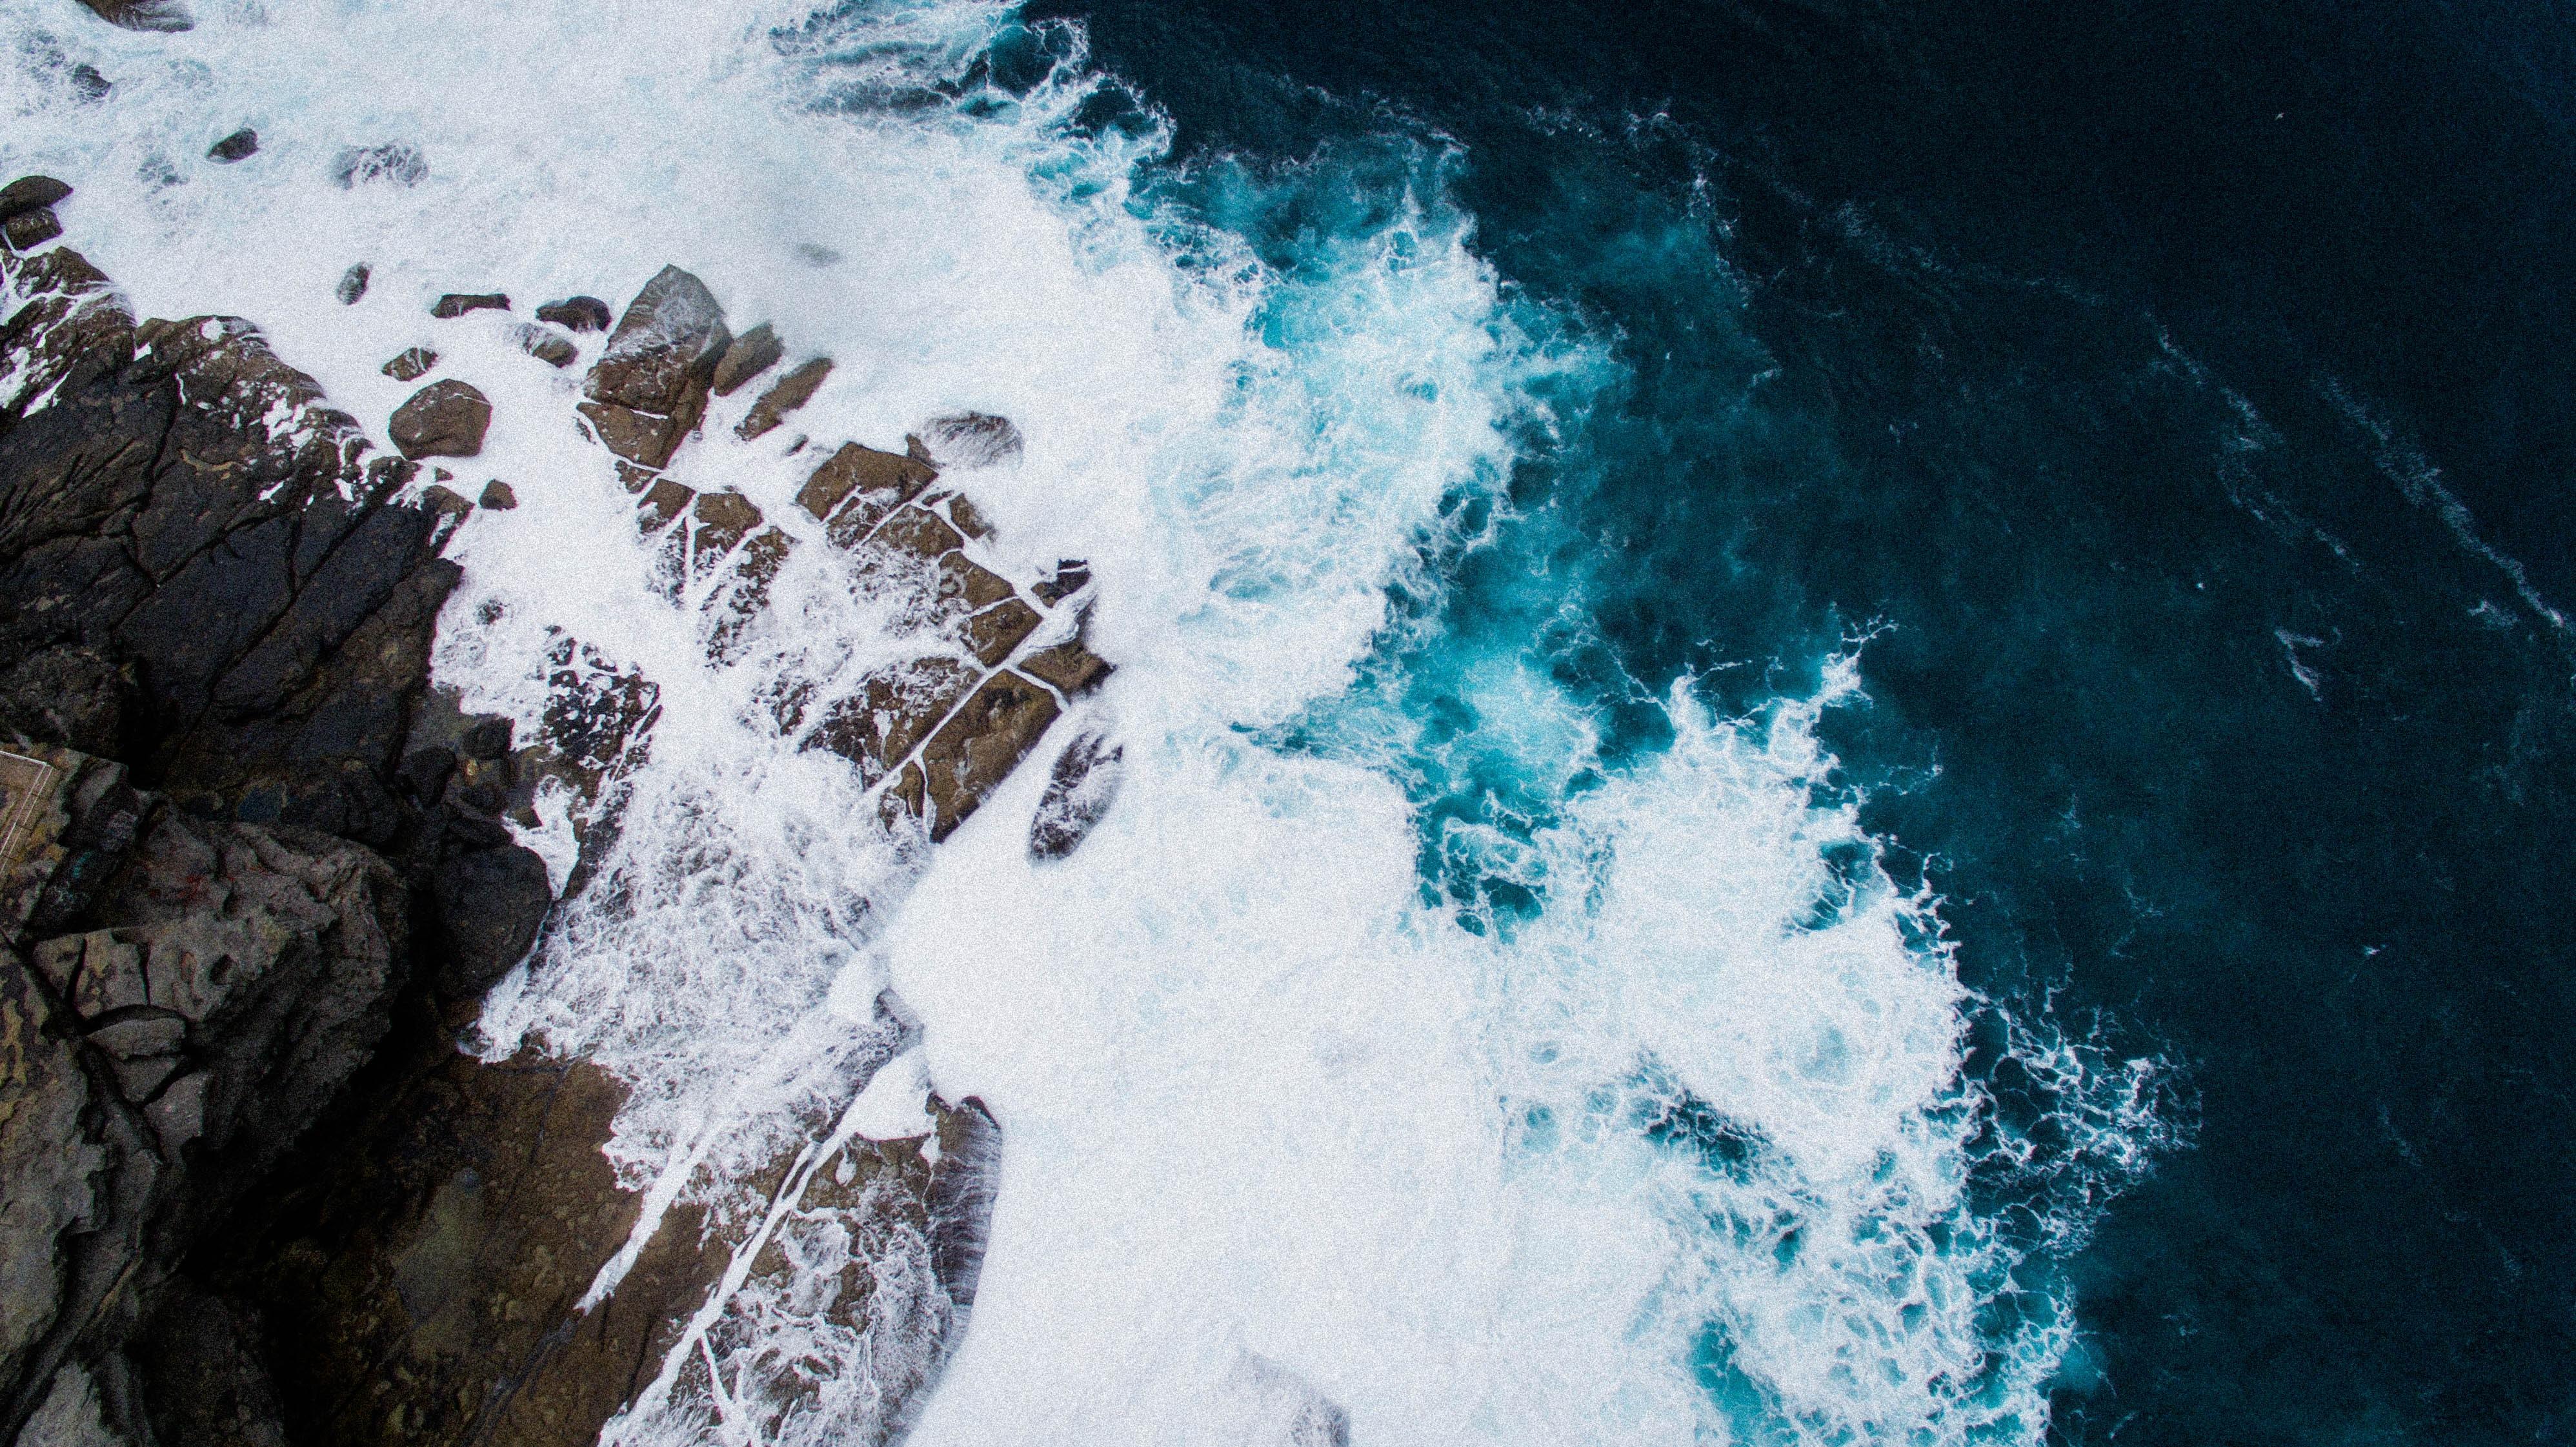 aerial photo of body of water crashing stone